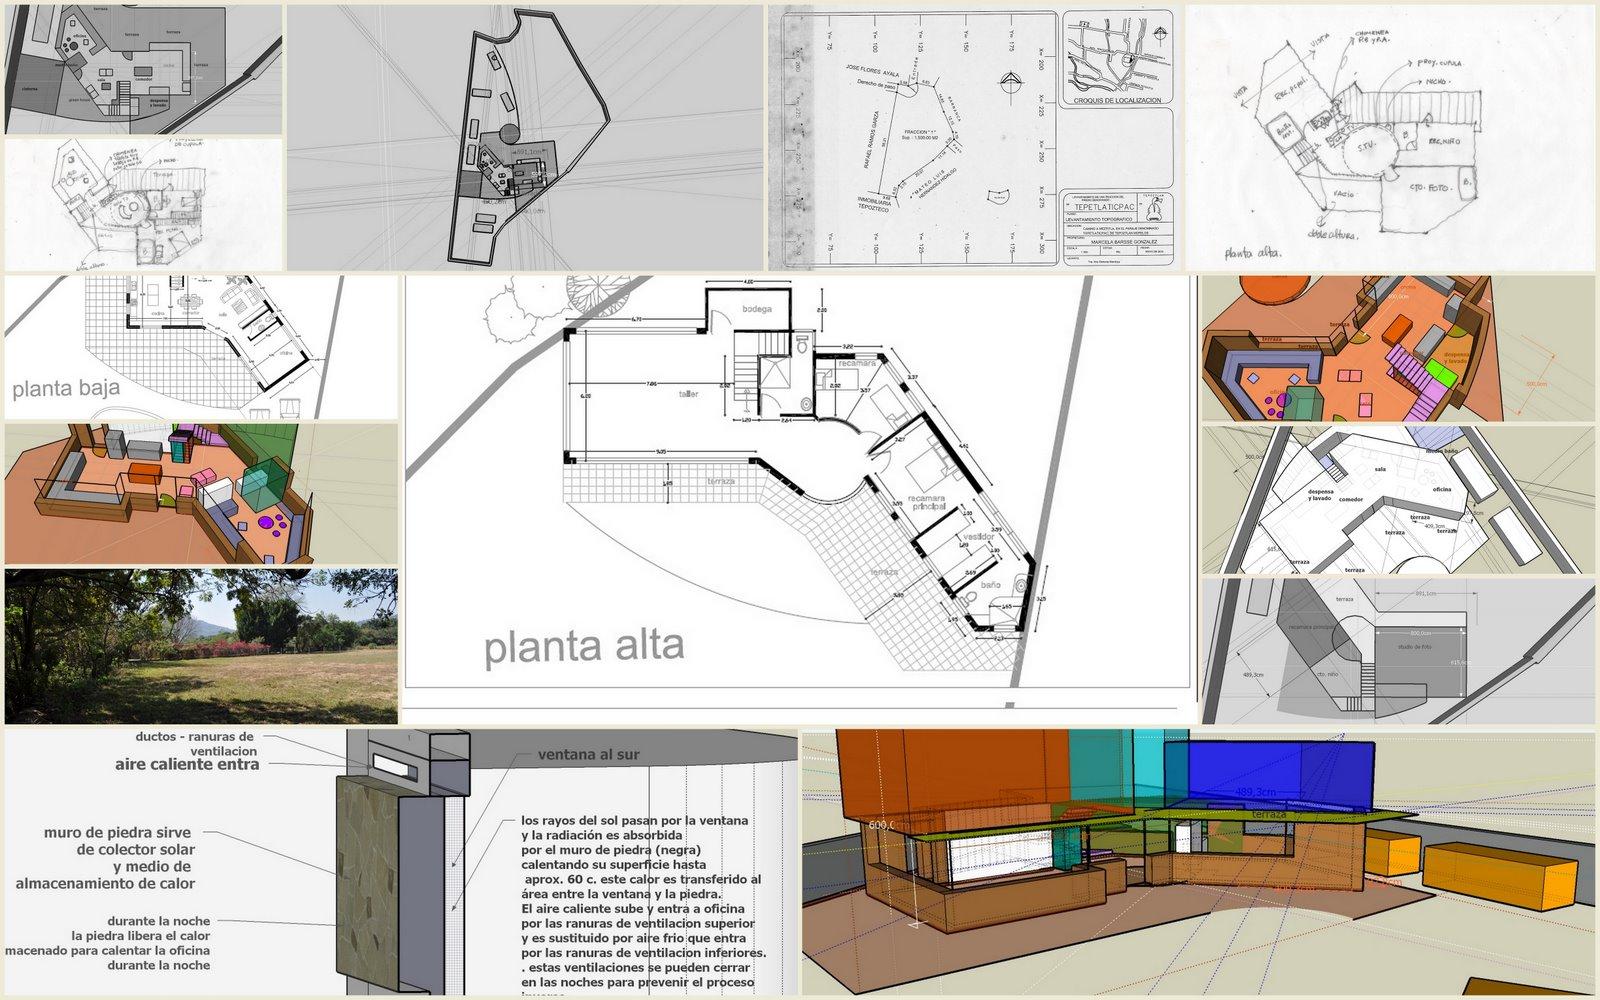 Econstructivismo dise o bioclim tico de casa habitaci n for Diseno de casa habitacion